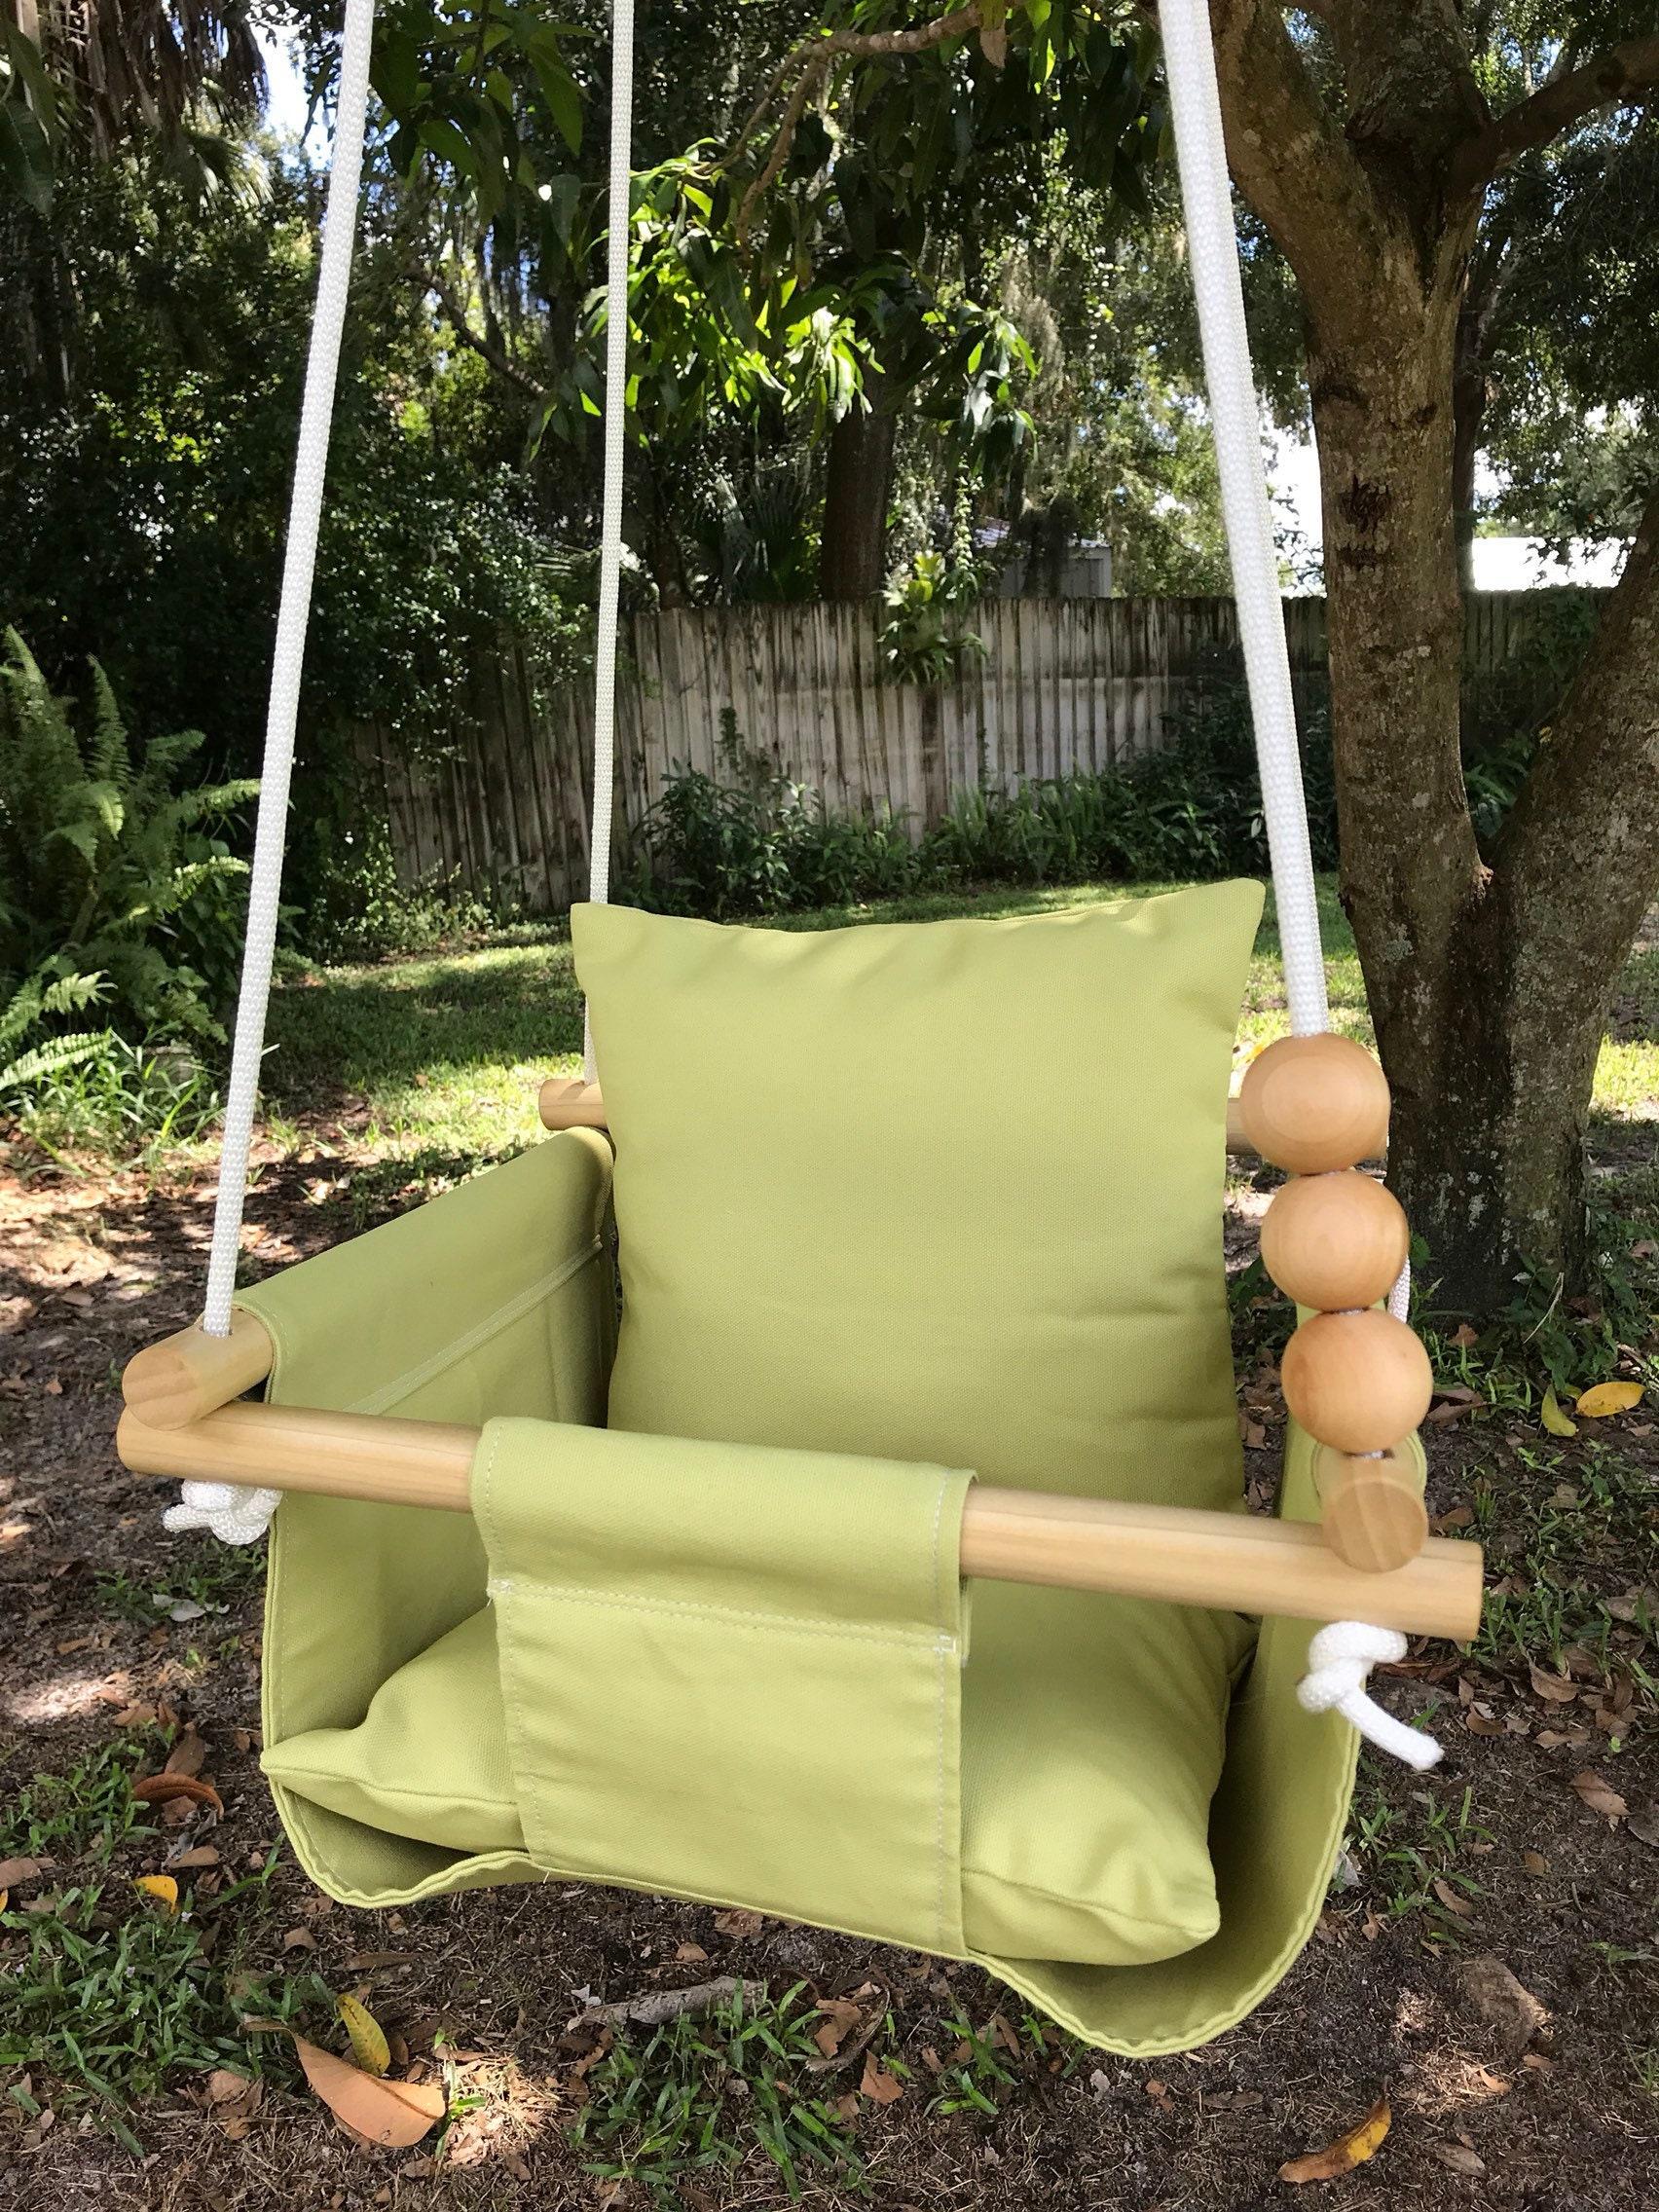 Baby Swing, Kiwi Green Swing, First Birthday Gift, Baby Shower Gift, Canvas  Swing, Lime Swing, Outdoor Swing, Nursery Decor